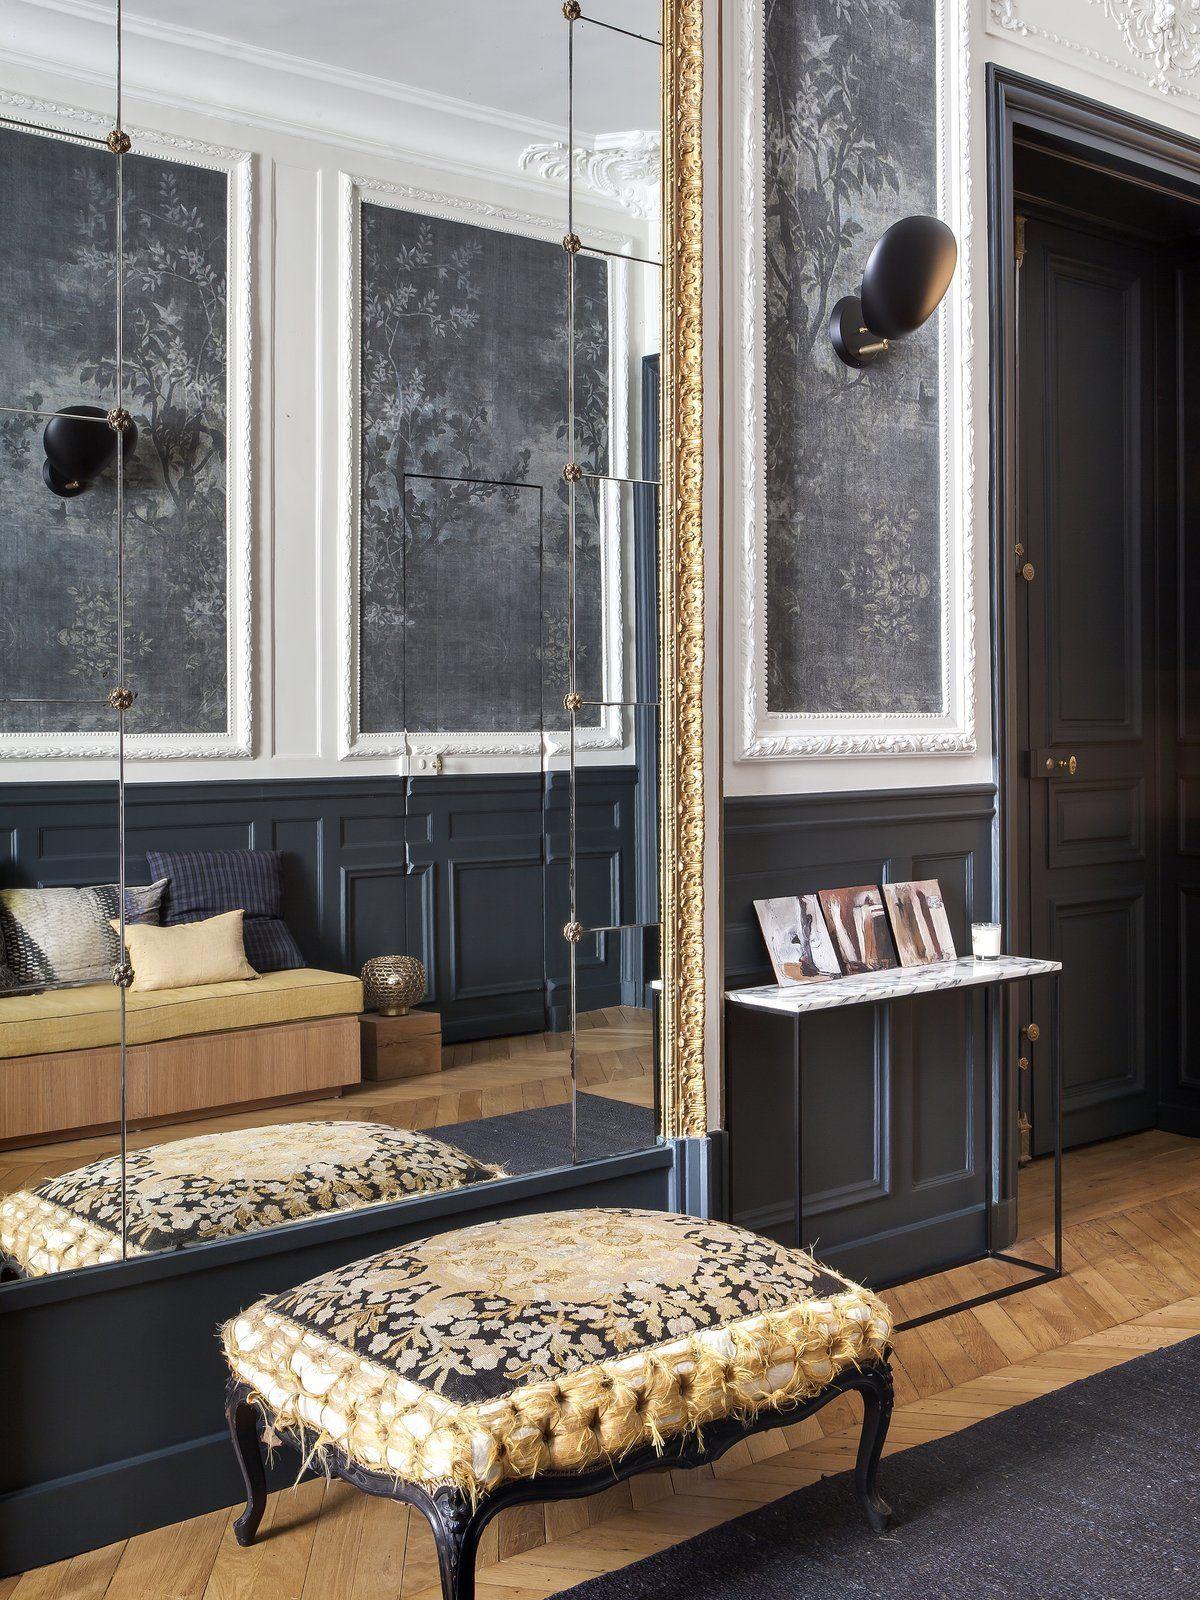 End of hallway decor  Living Room Stools Wall Lighting Medium Hardwood Floor Rug Floor